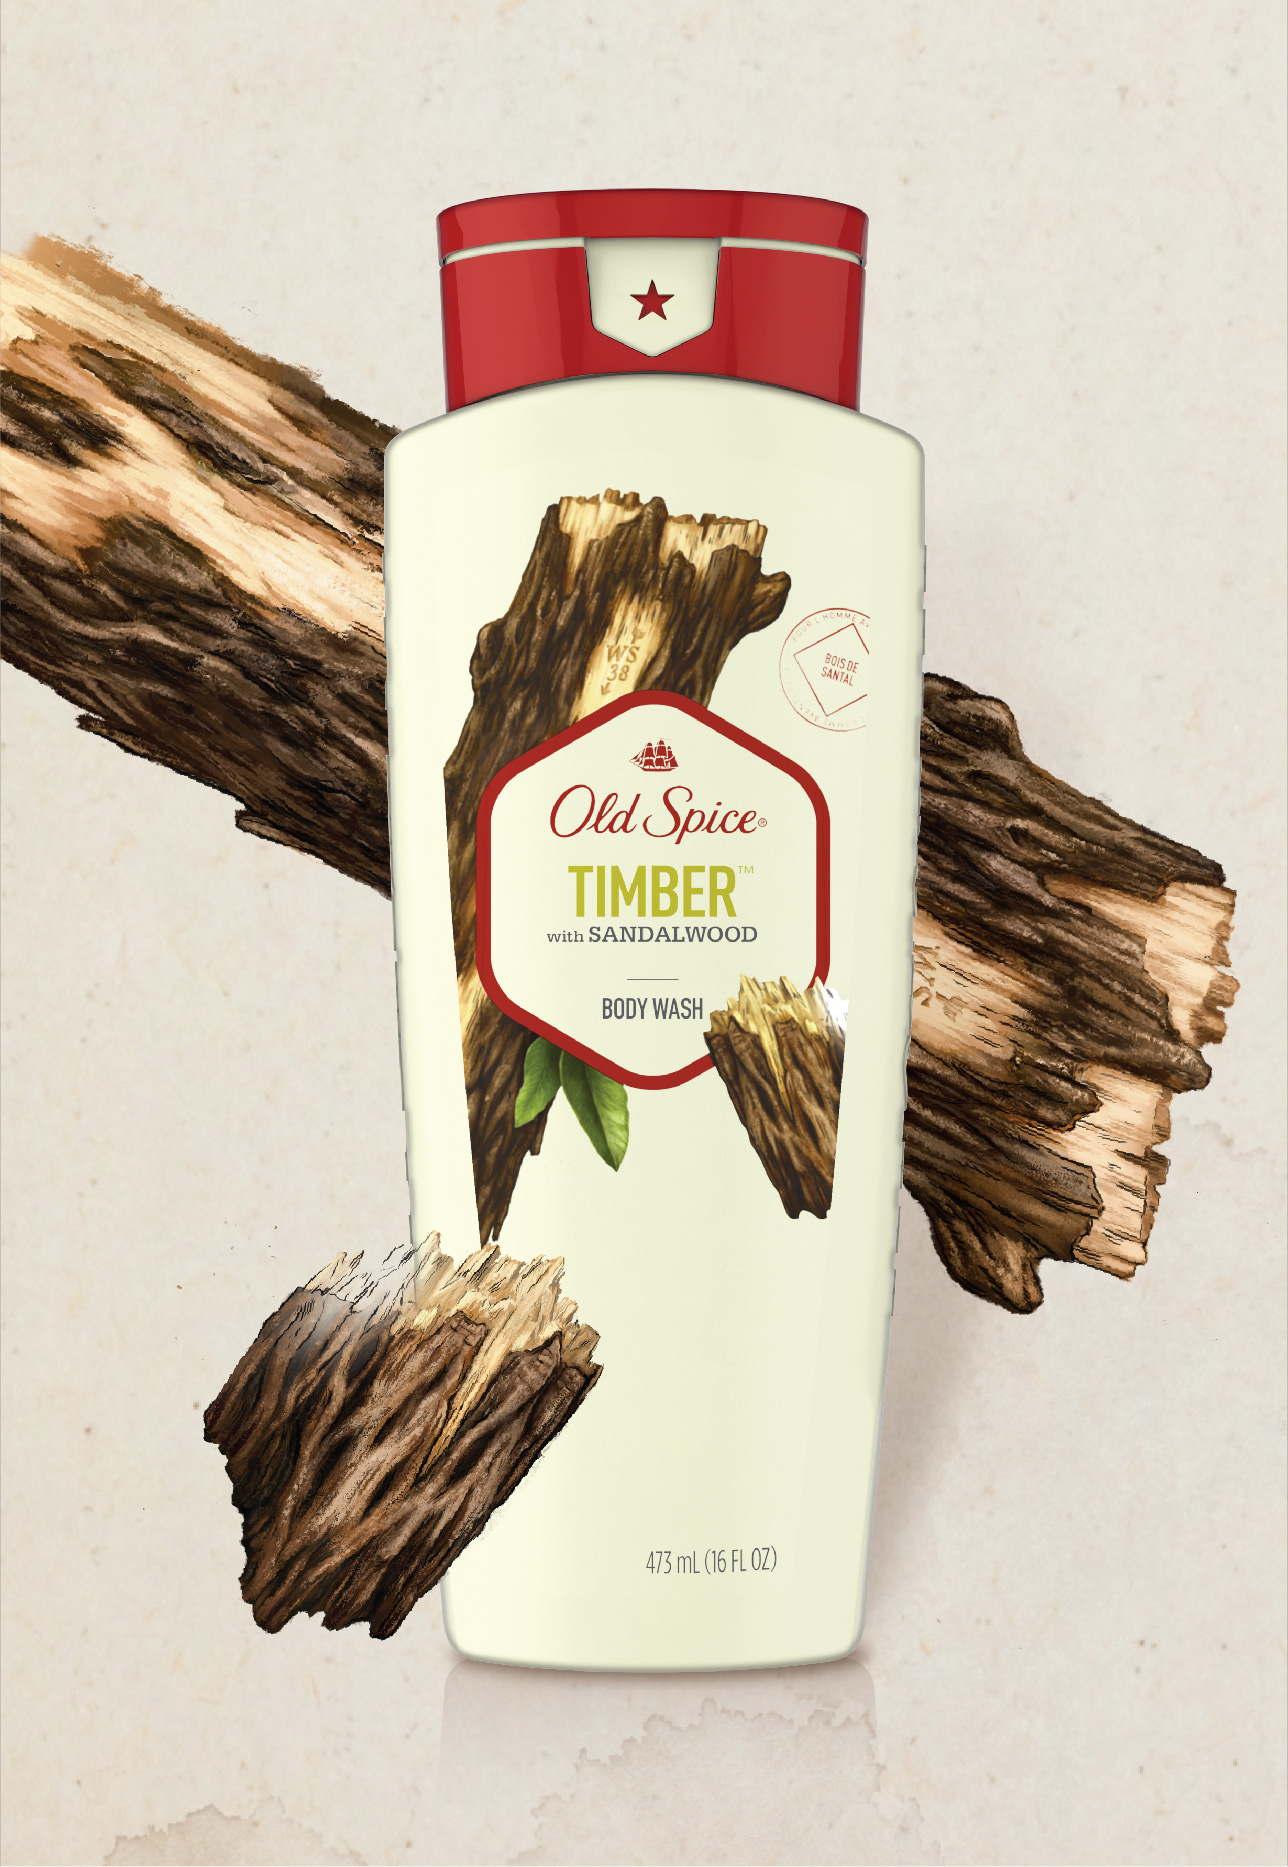 Timber with Sandalwood Body Wash